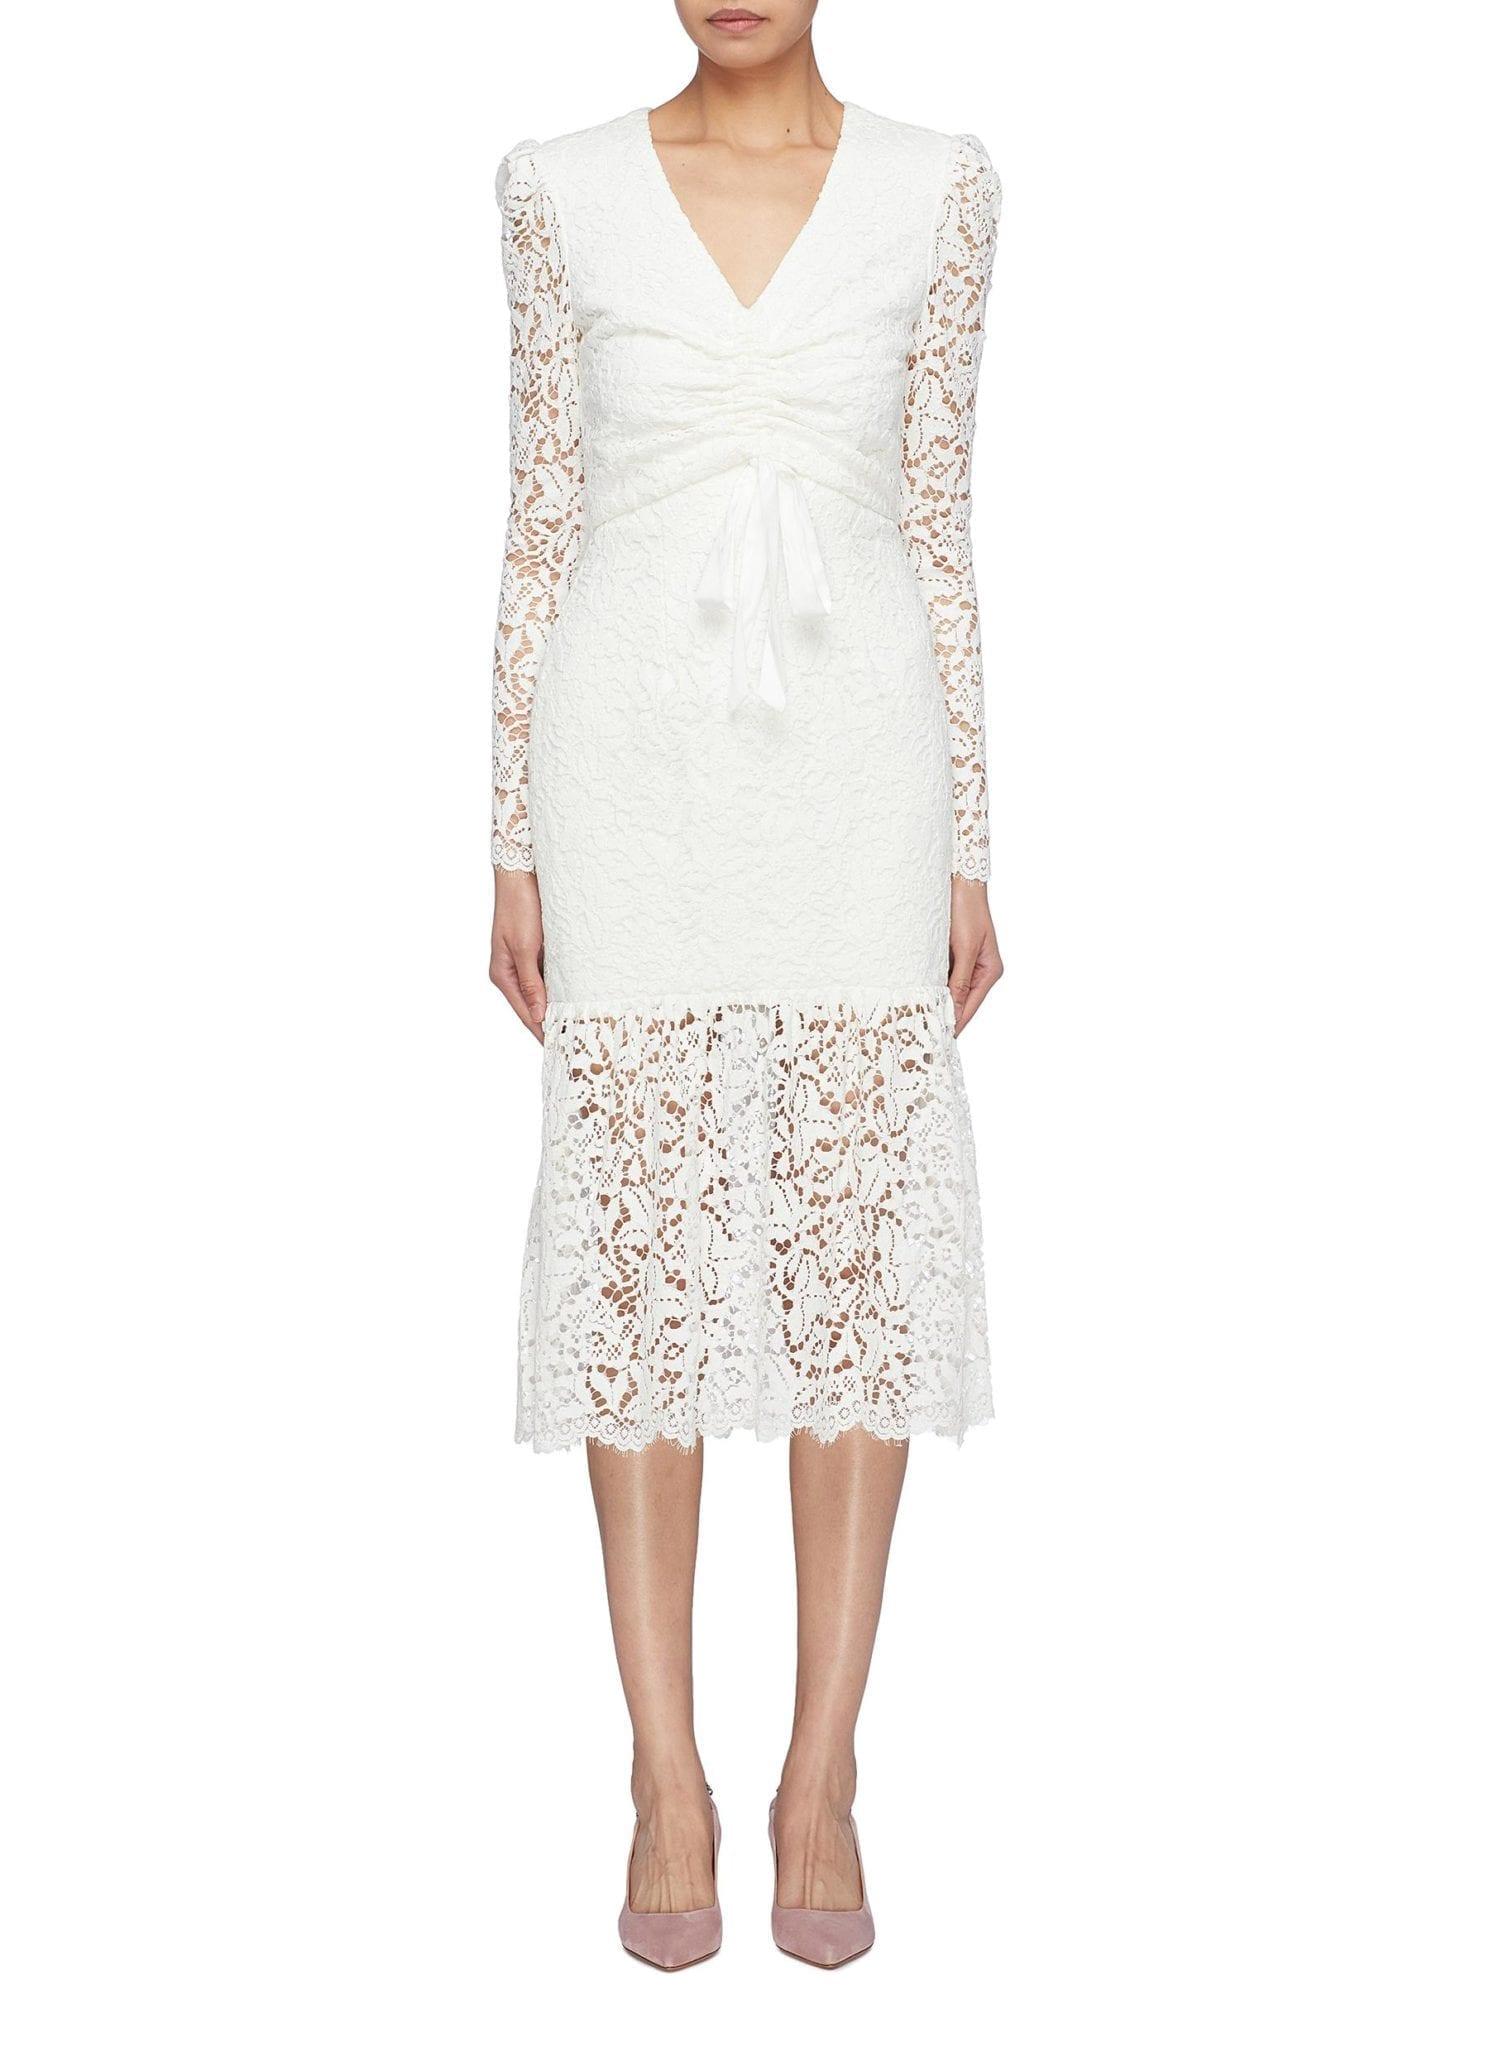 REBECCA VALLANCE 'Le Saint' Ruched Tie Front Guipure Lace Mermaid White Dress